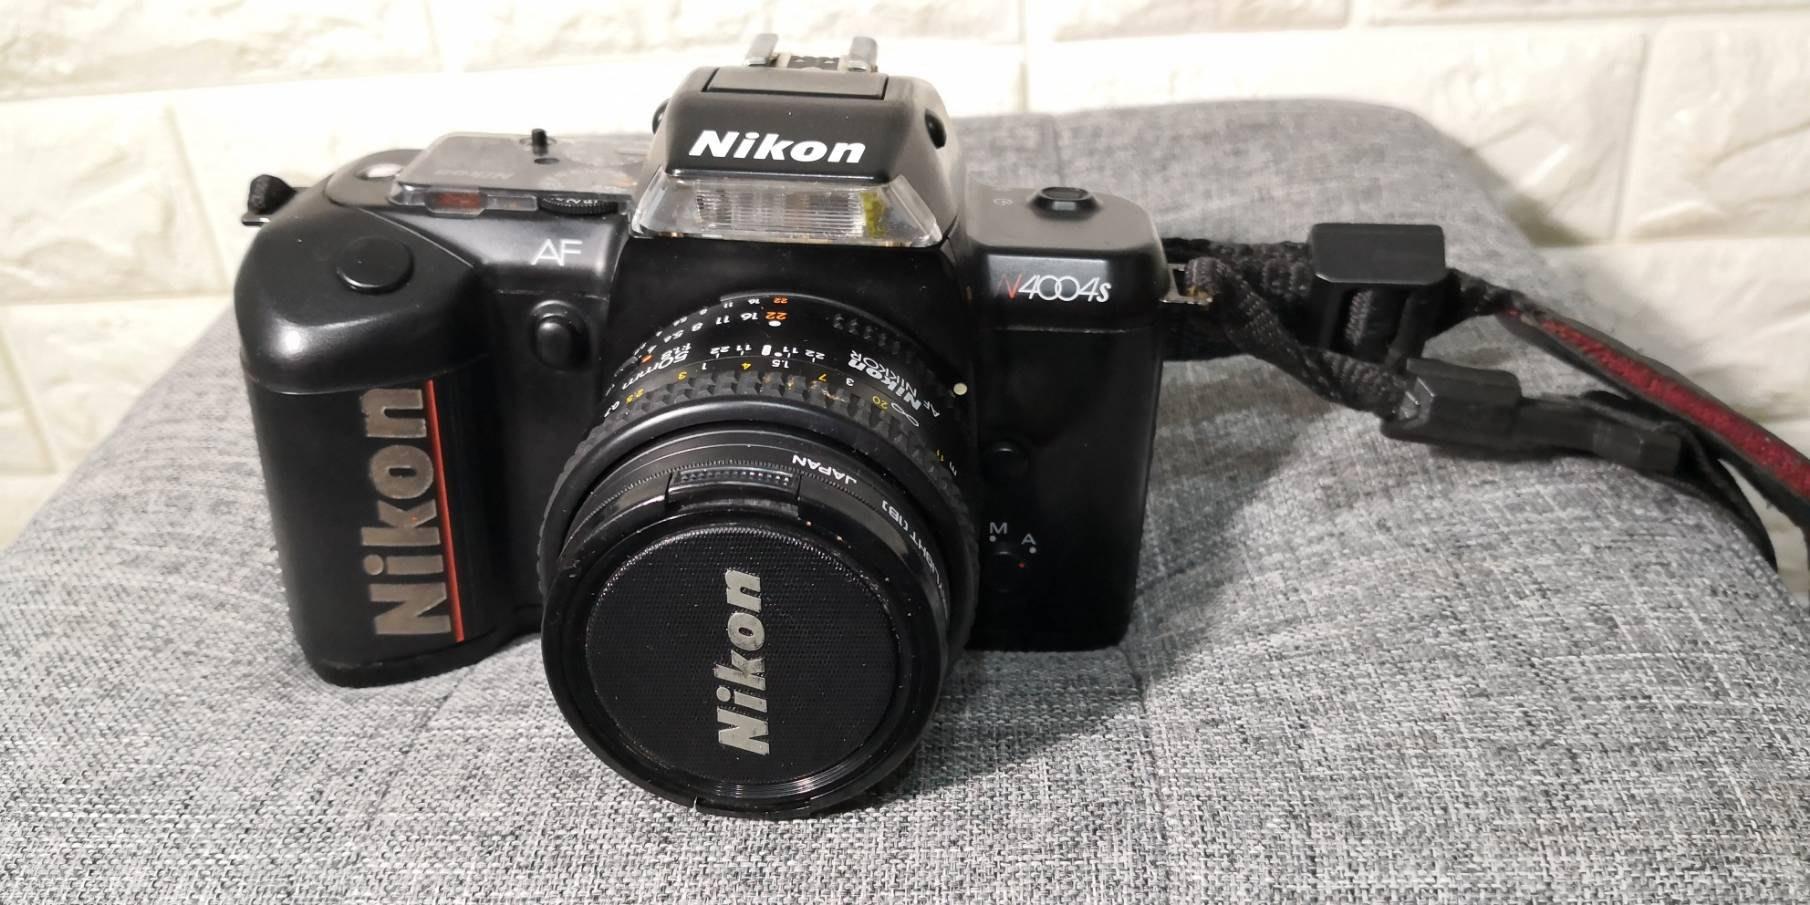 Nikon N4004s + Nikon 50mm1.8/f 老相機